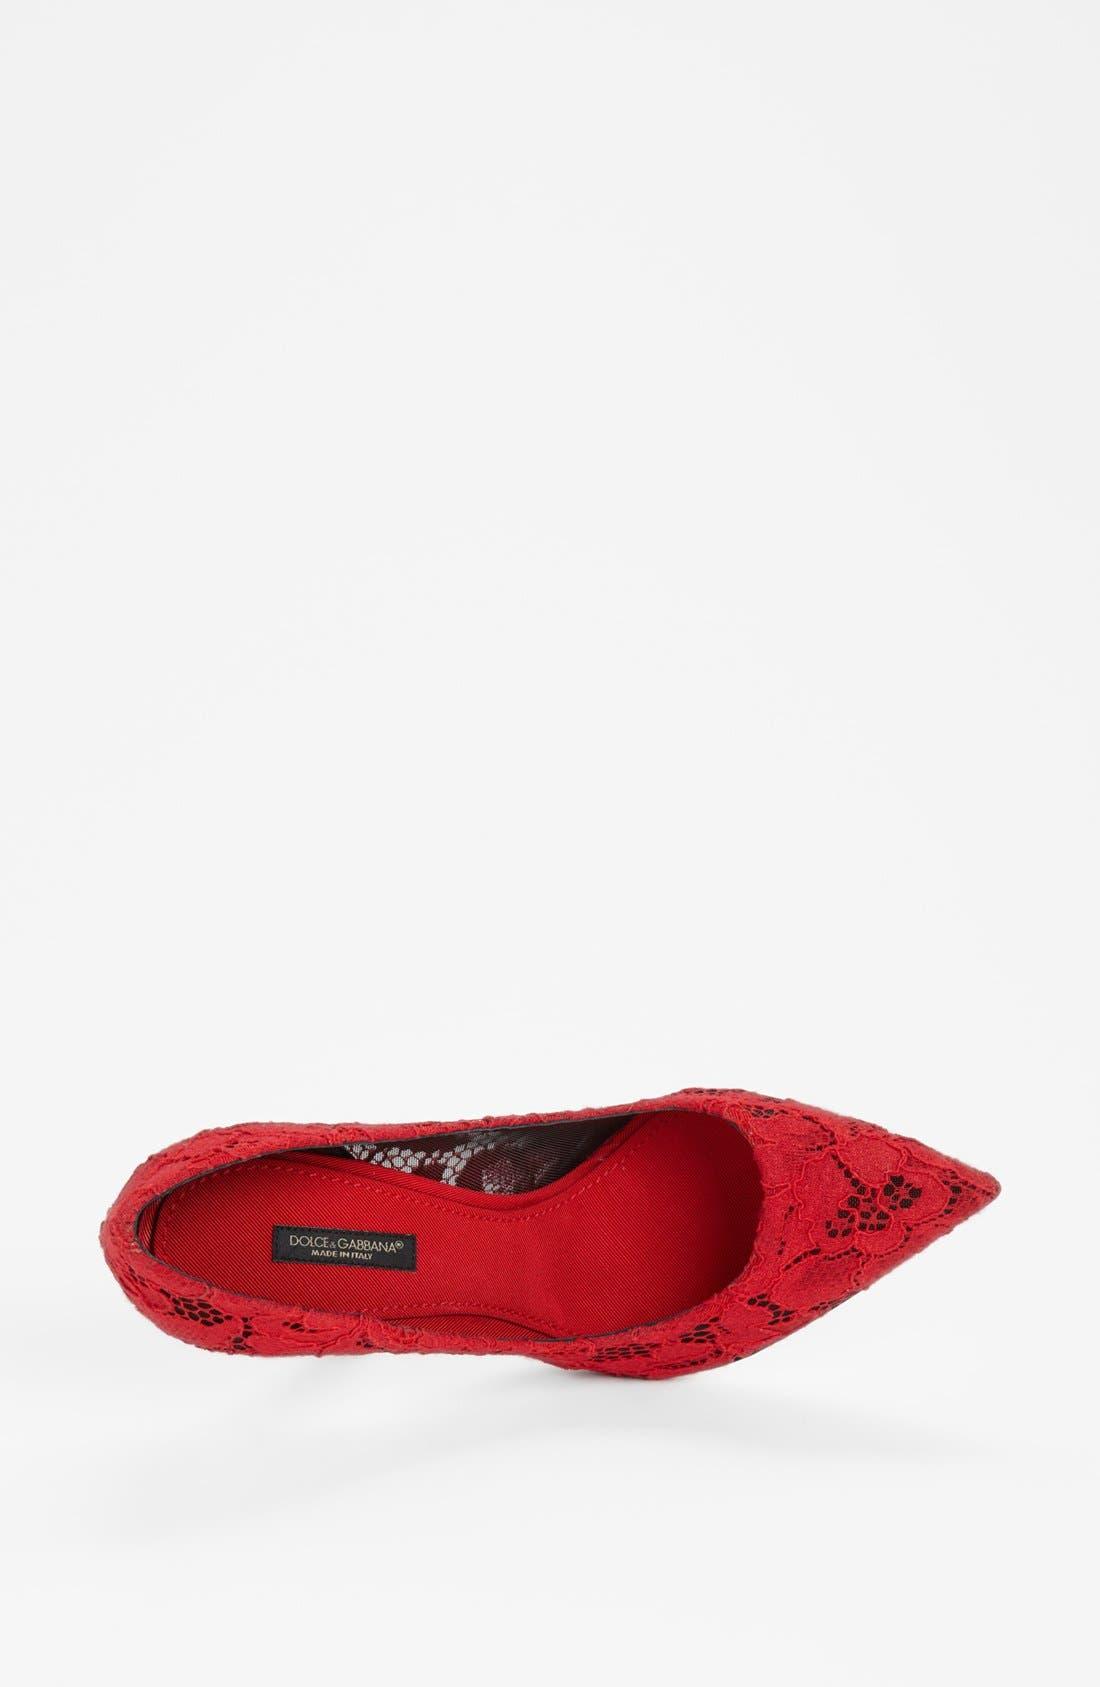 Alternate Image 3  - Dolce&Gabbana Lace Pointy Toe Pump